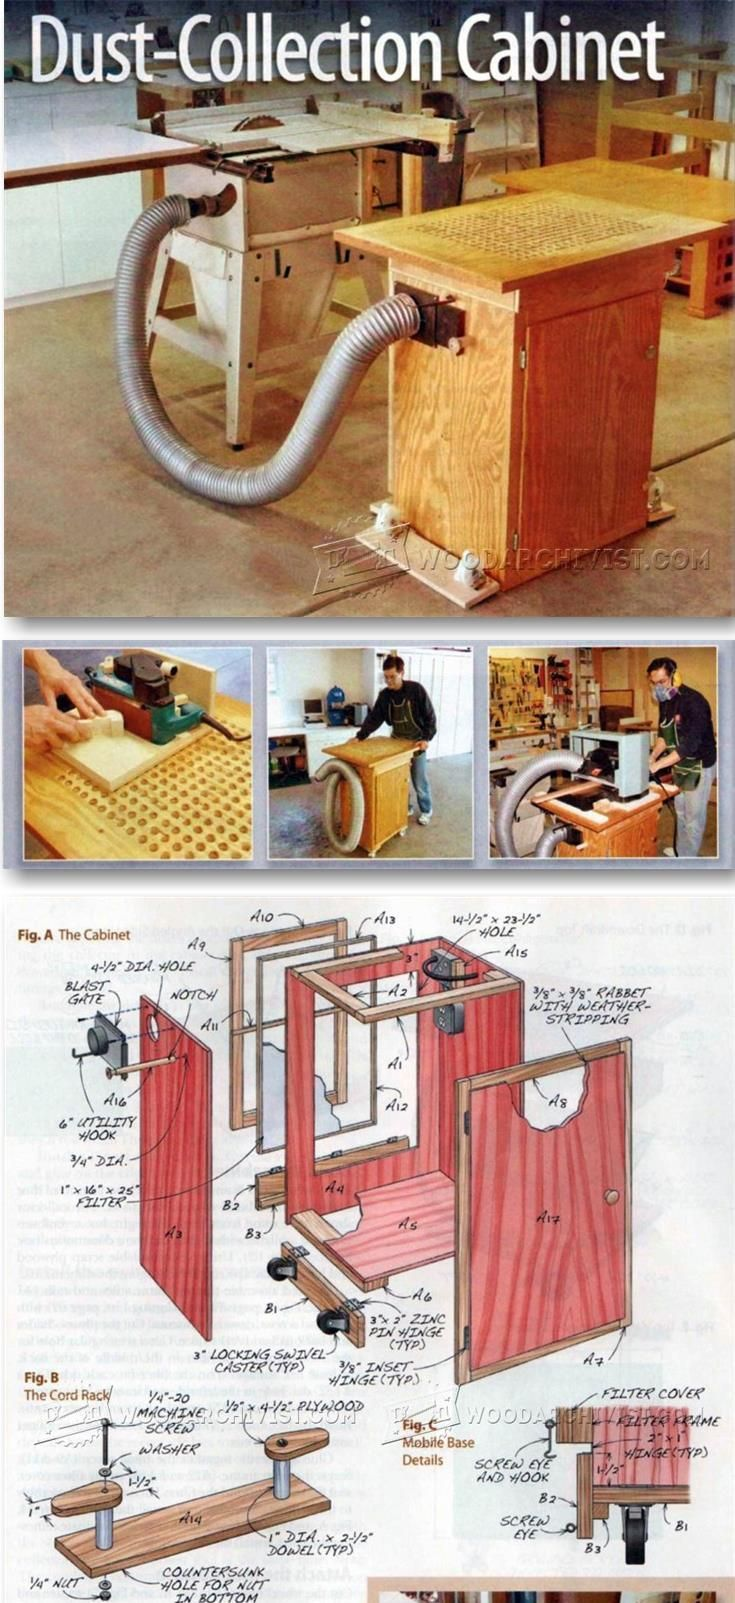 Downdraft Table Plans - Sanding Tips, Jigs and Techniques | WoodArchivist.com